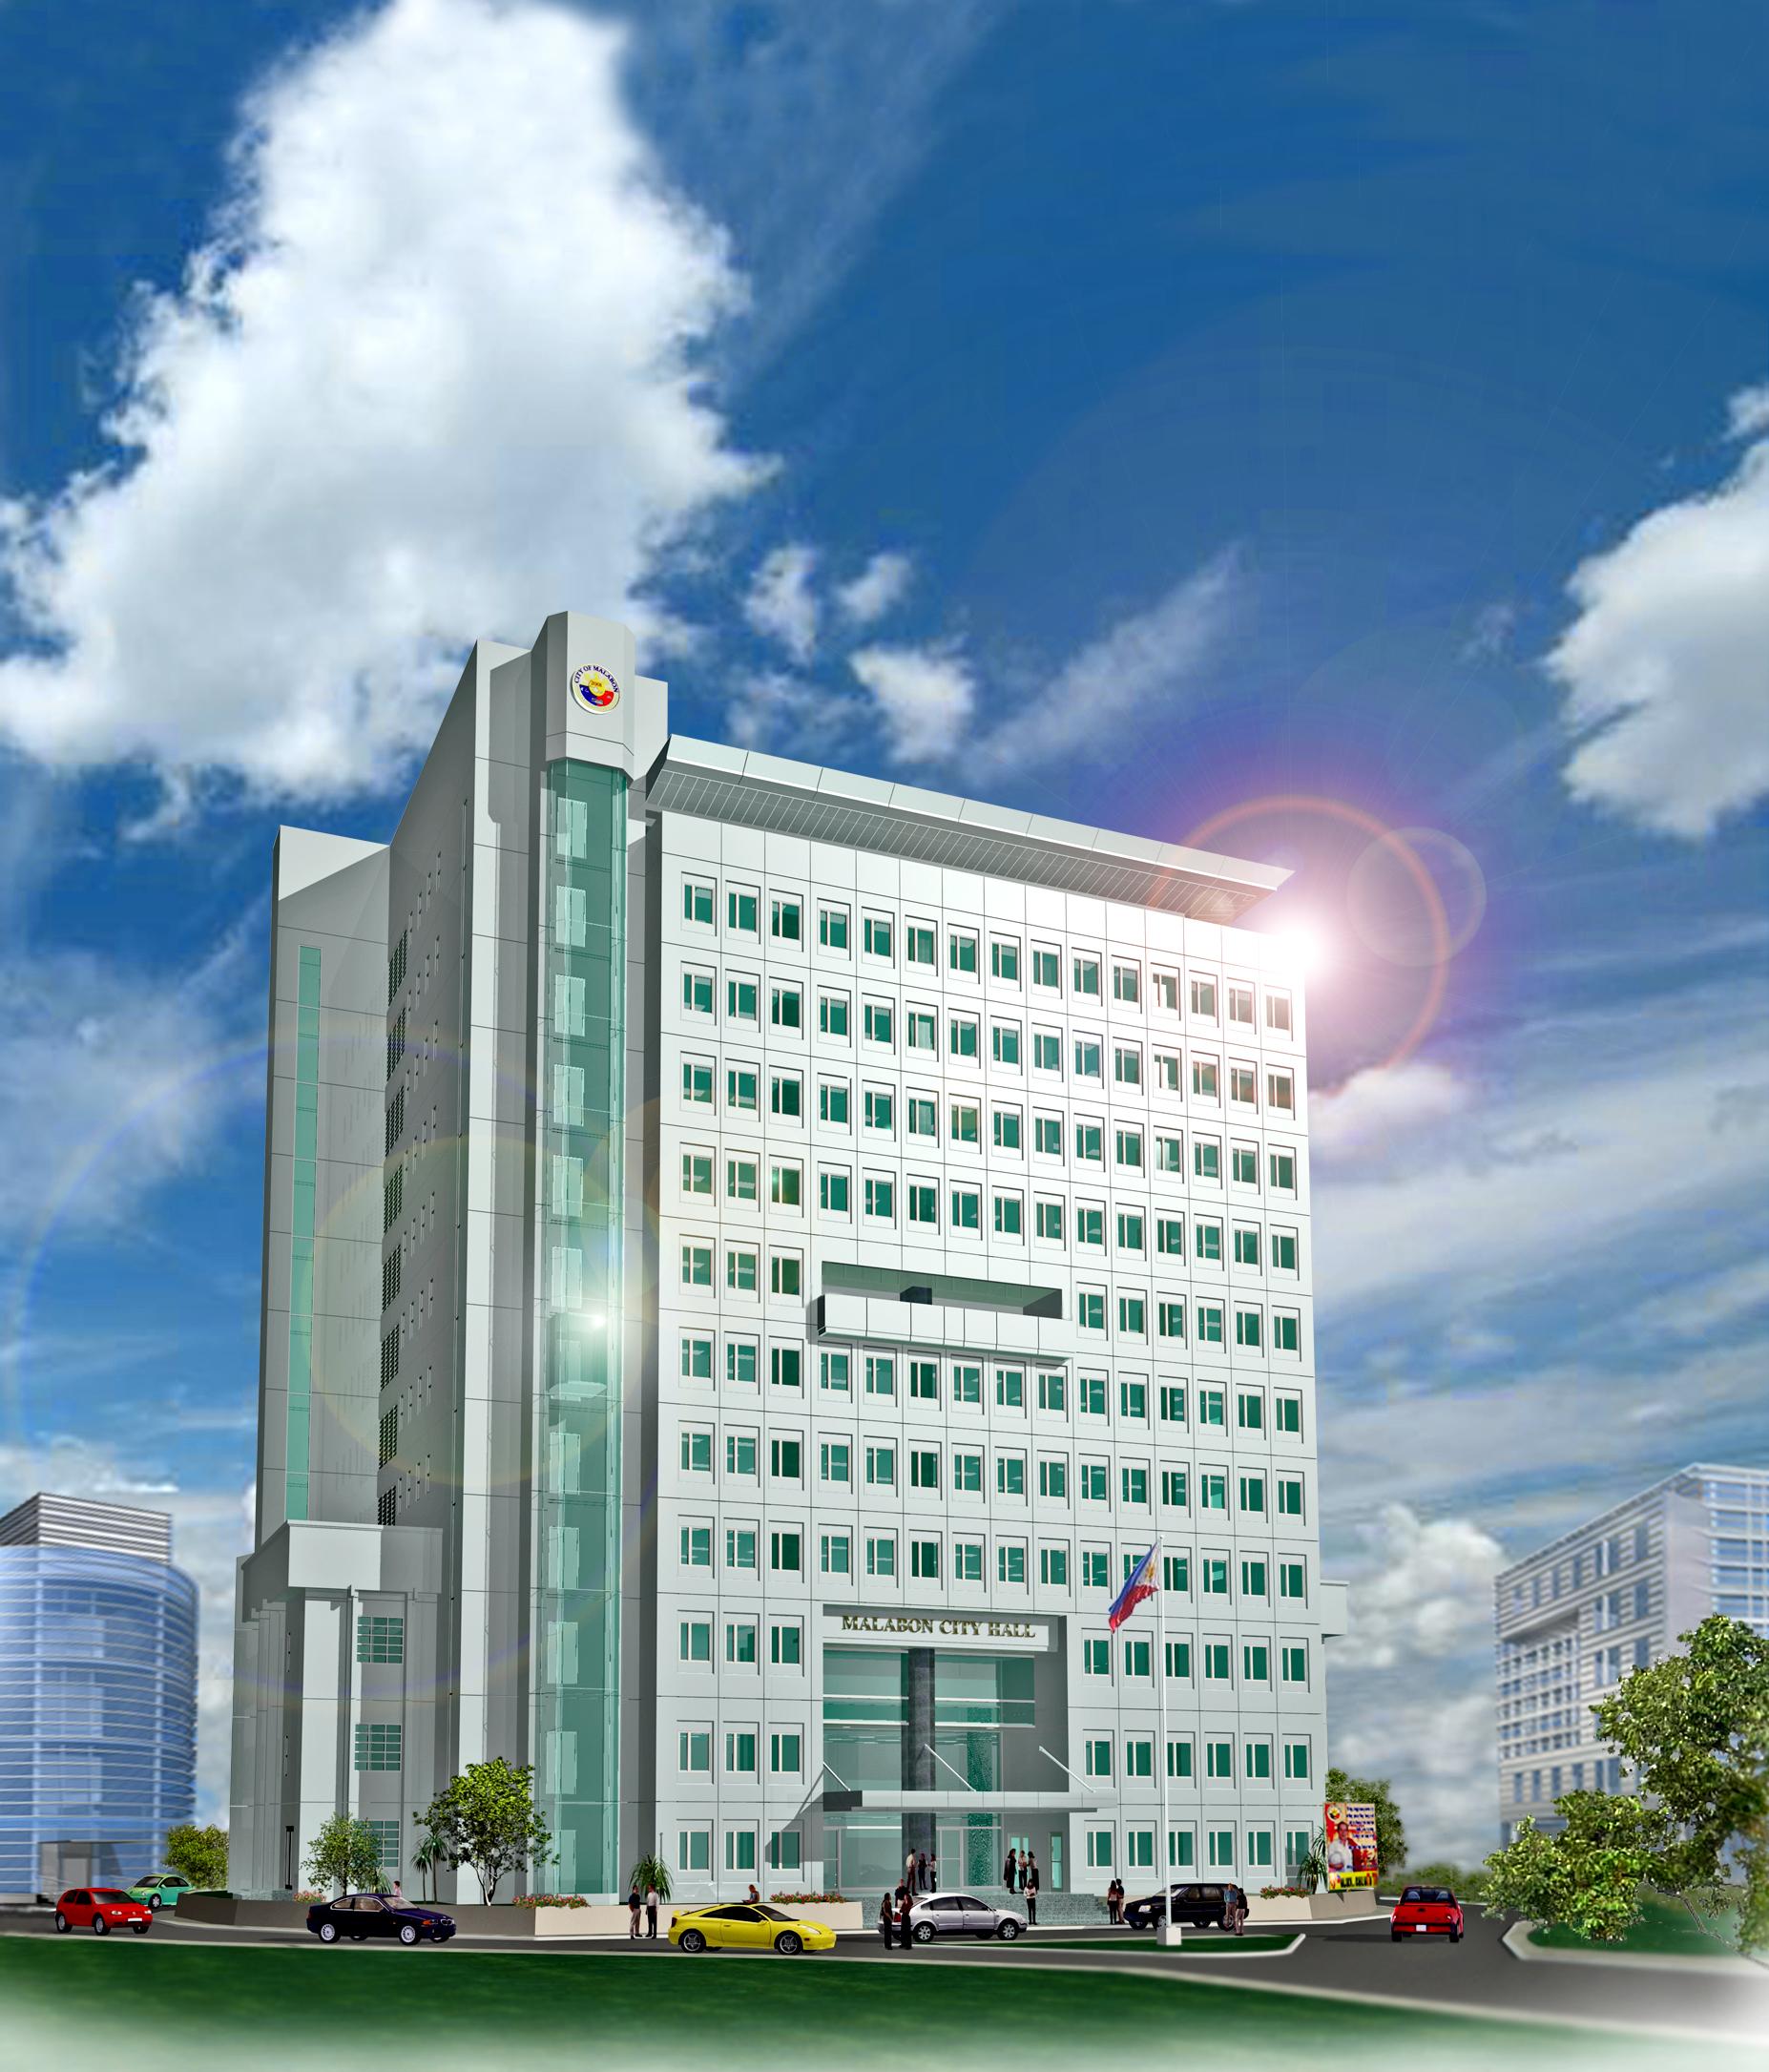 Malabon City Hall